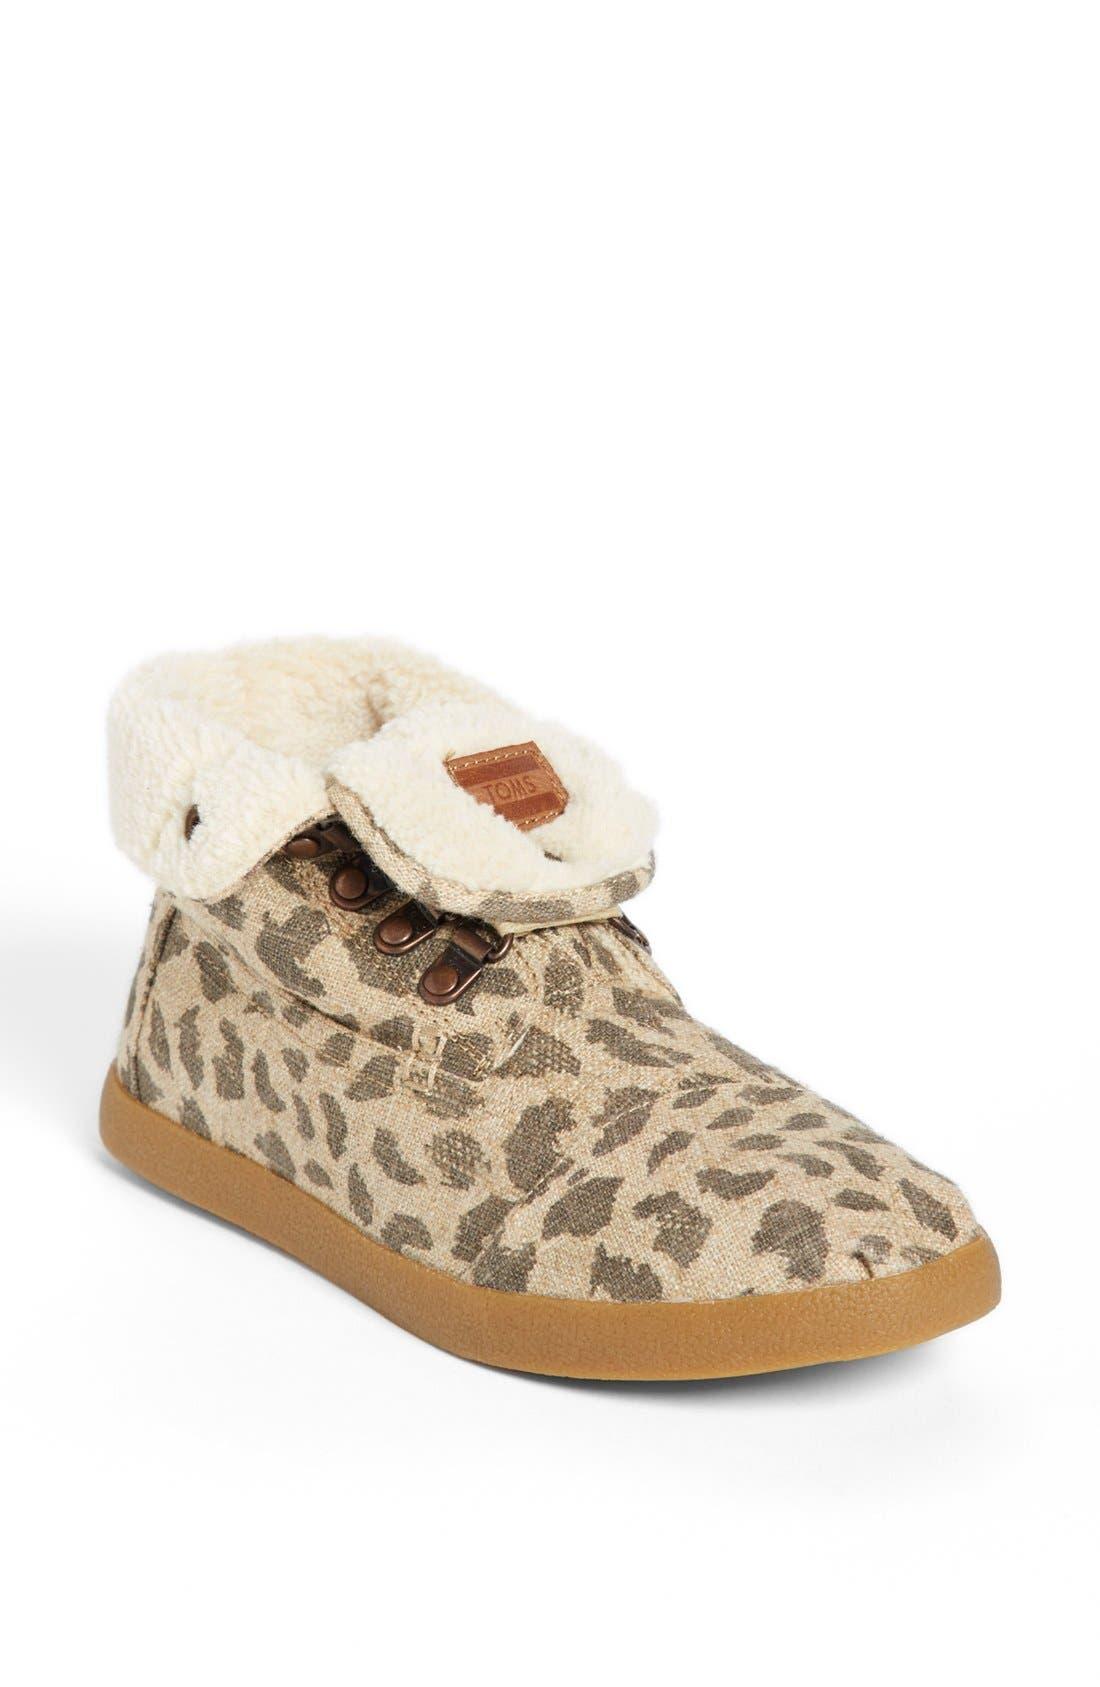 Main Image - TOMS 'High Botas' Fleece Boot